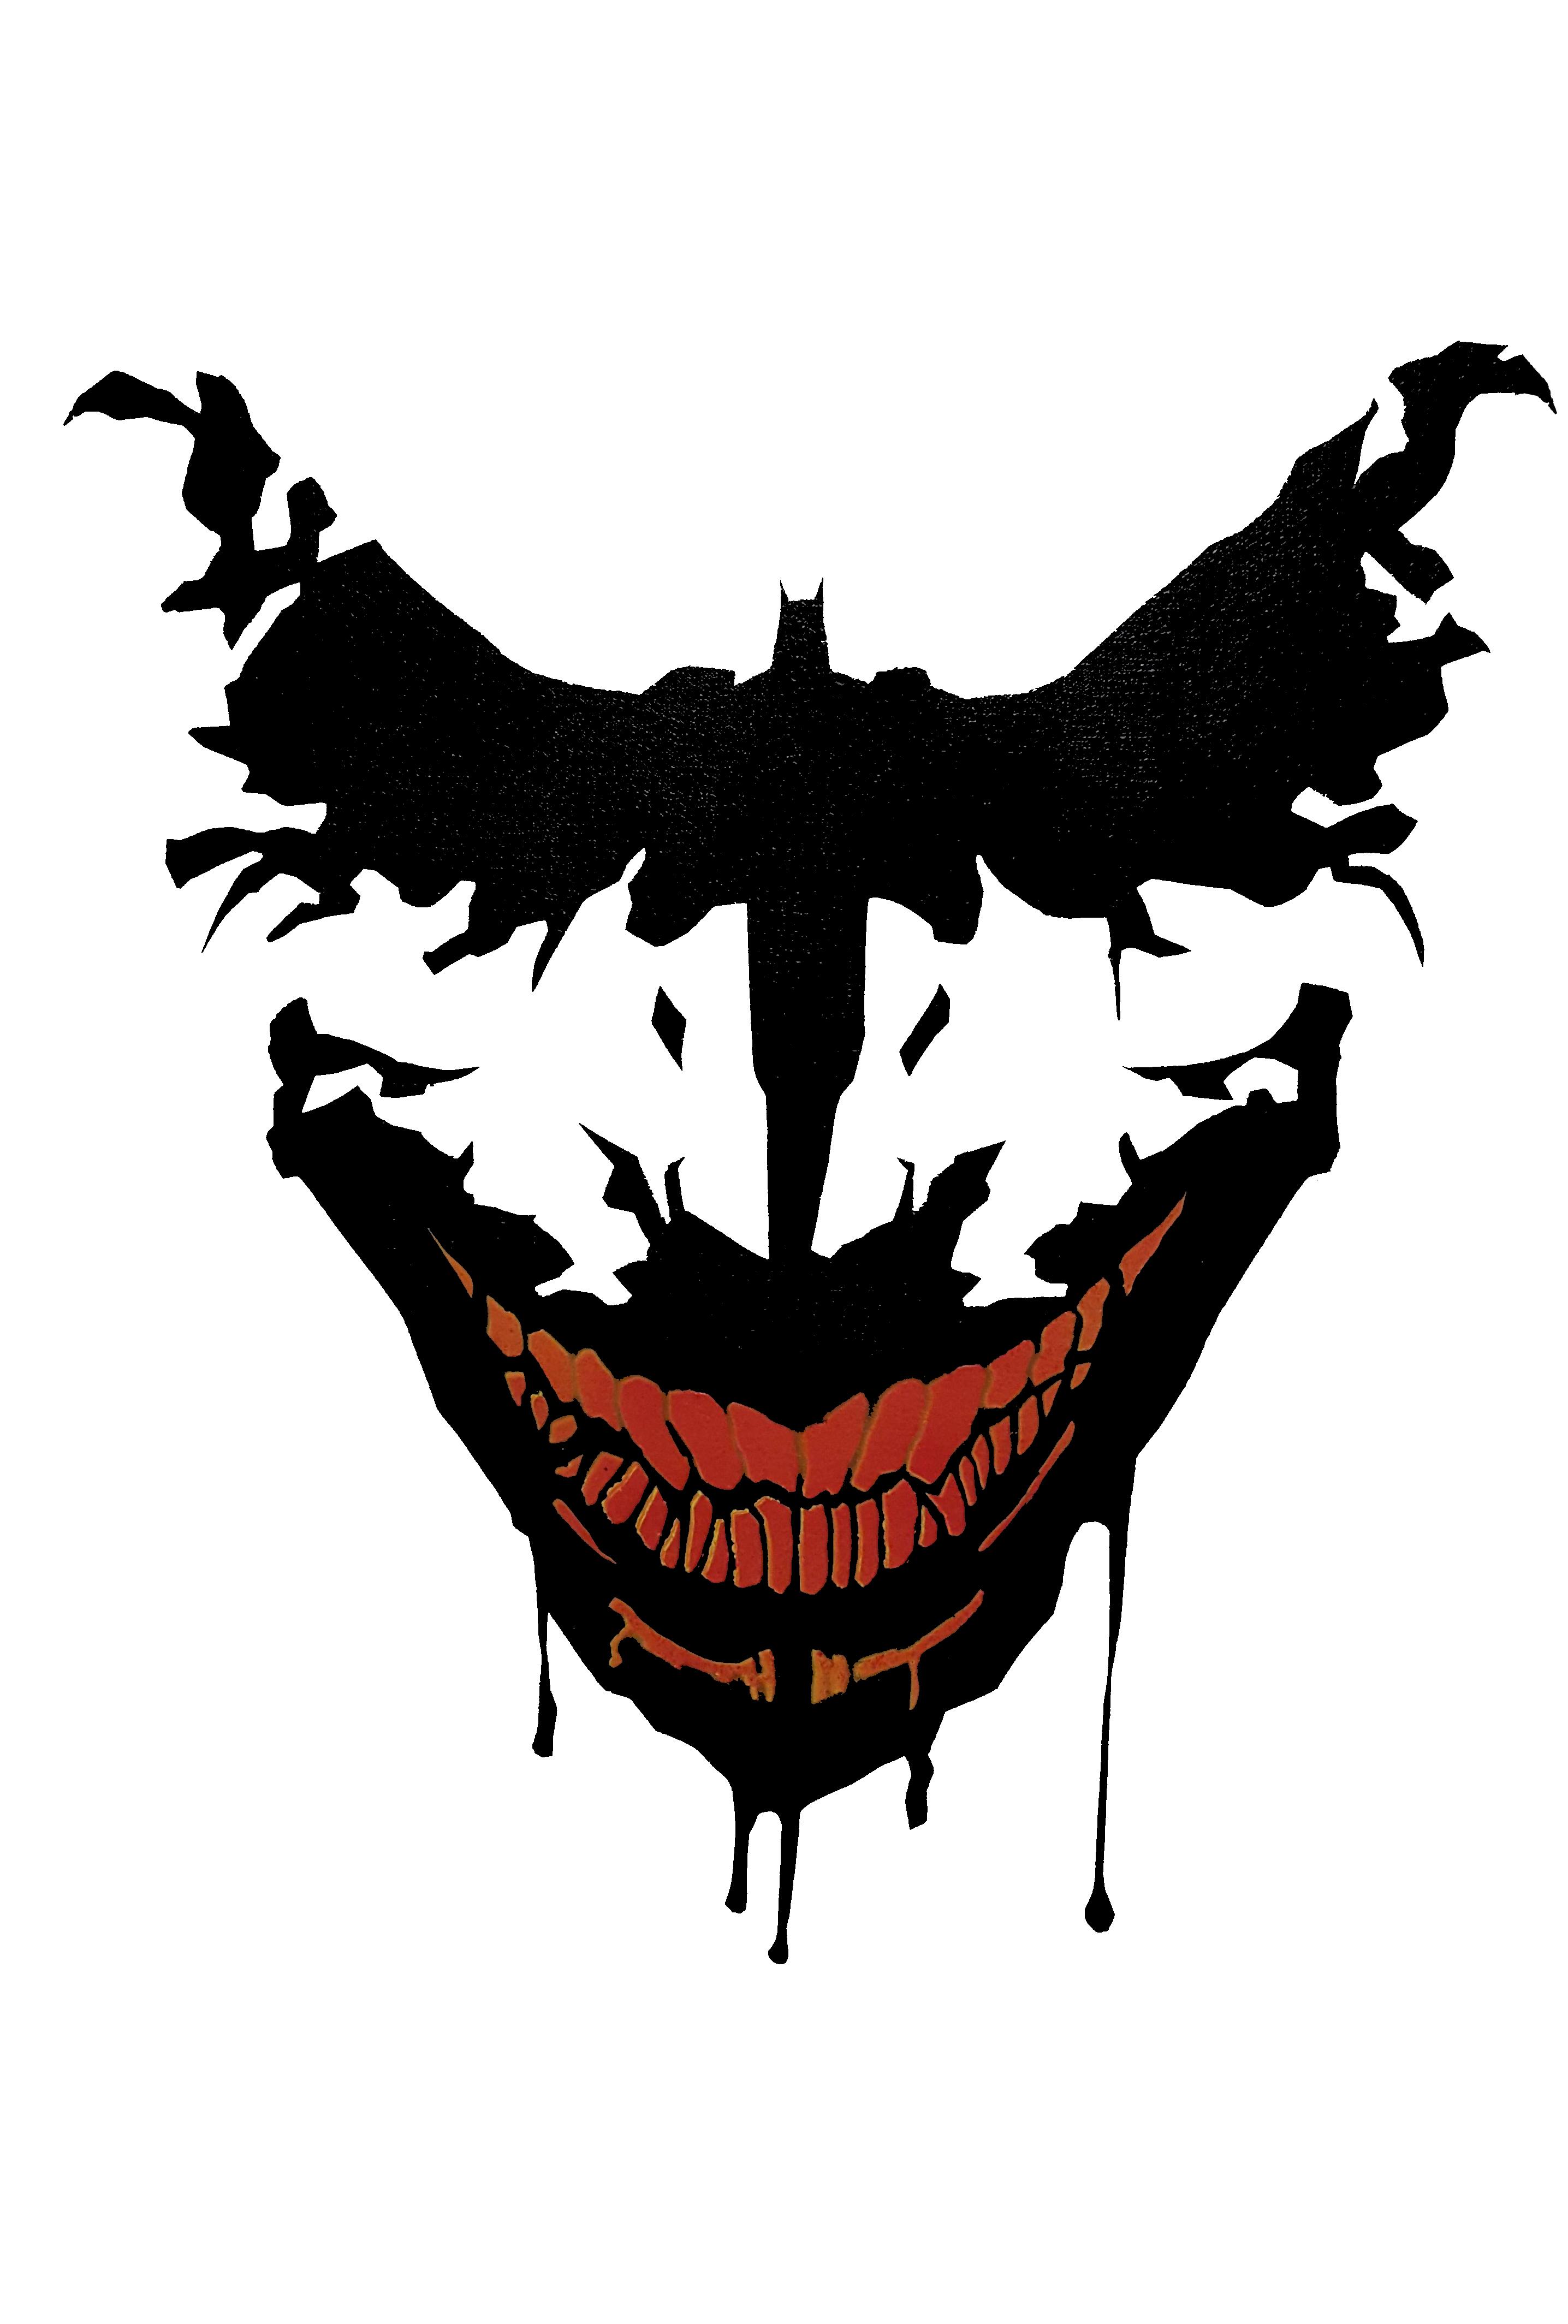 The Joker Symbol